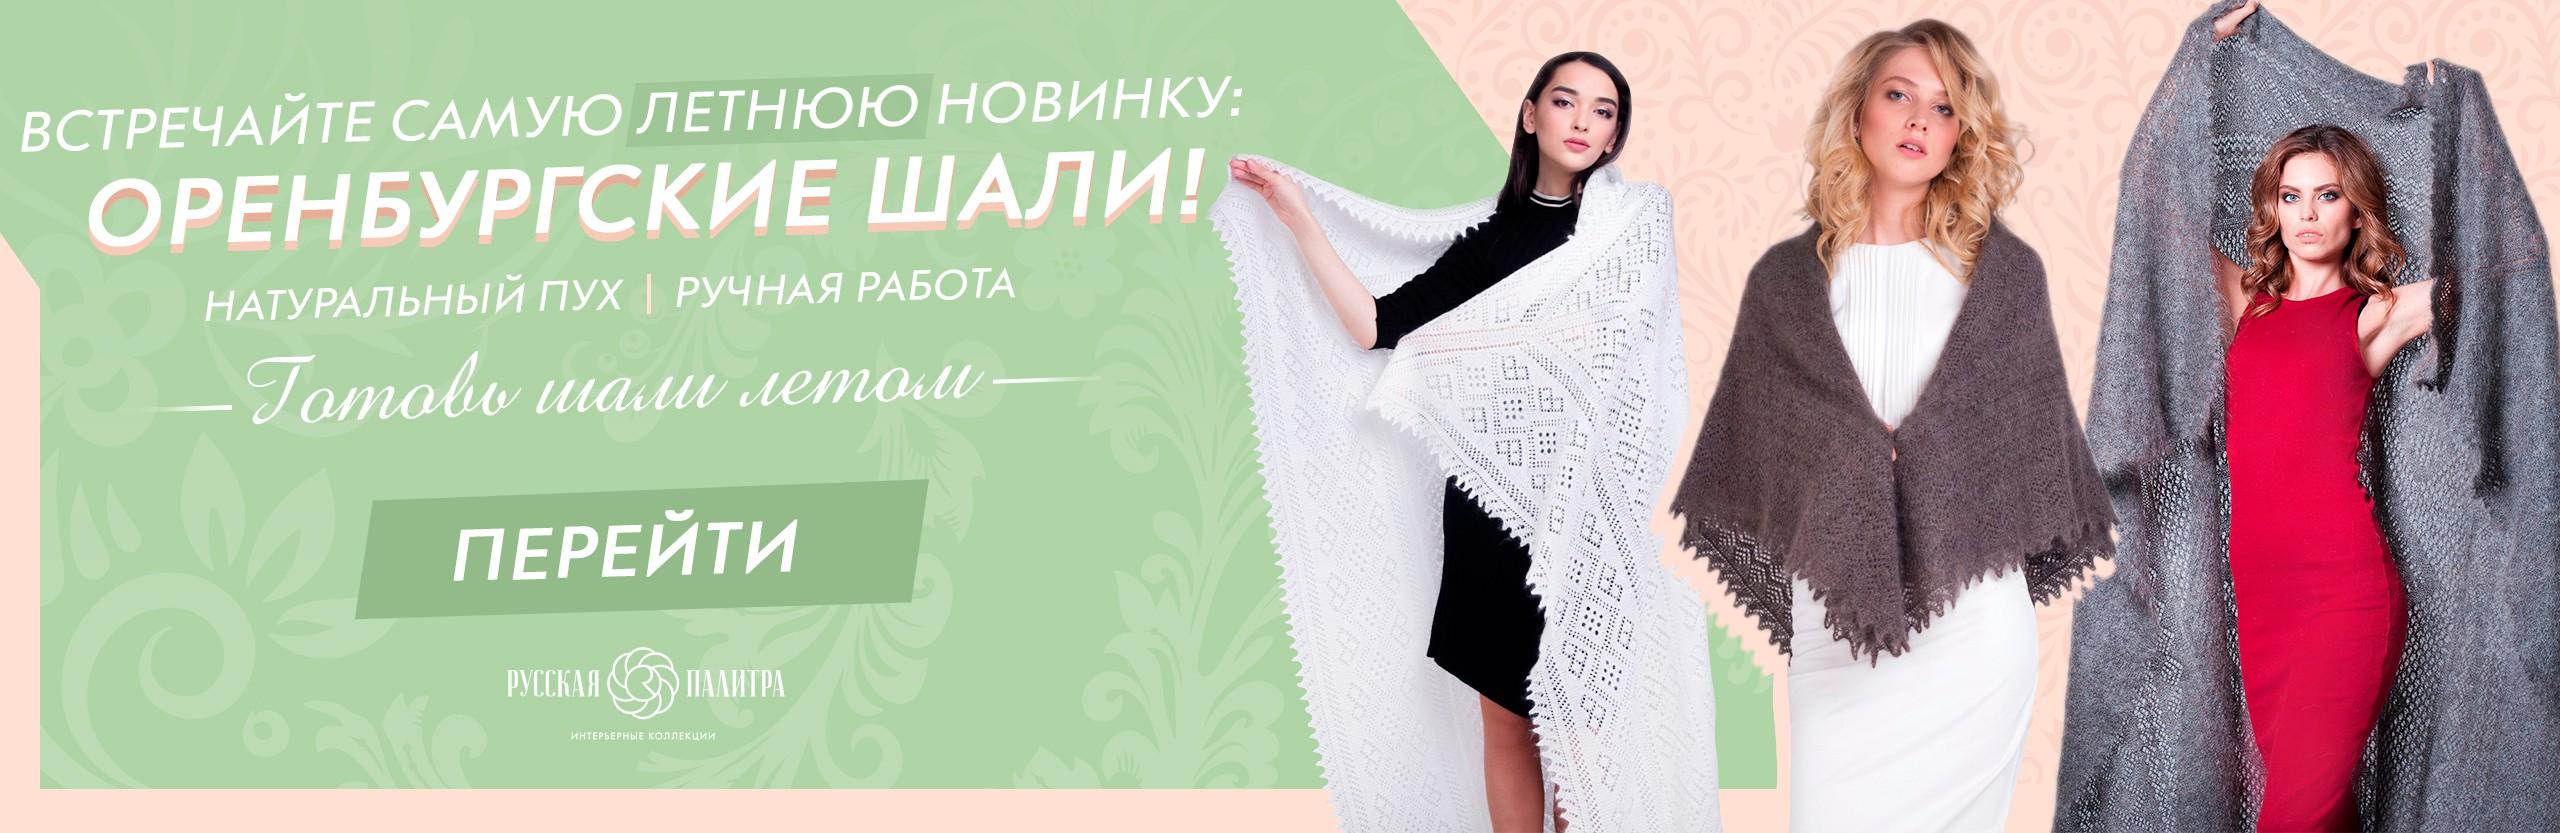 Оренбургские шали